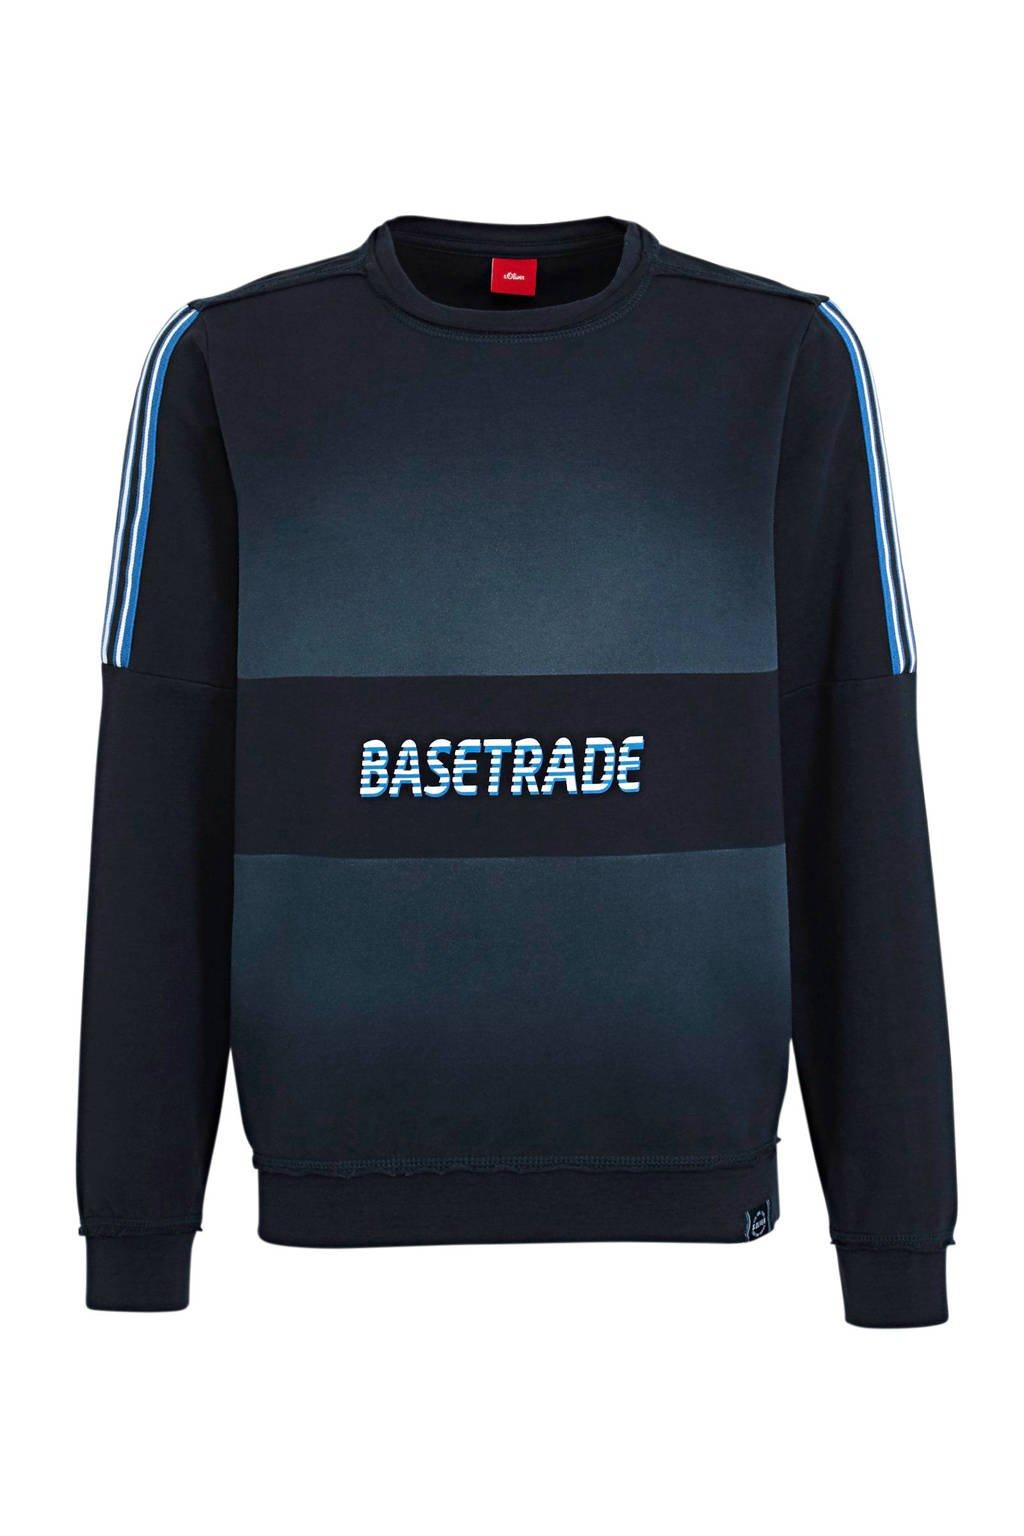 s.Oliver sweater met printopdruk donkerblauw, Donkerblauw